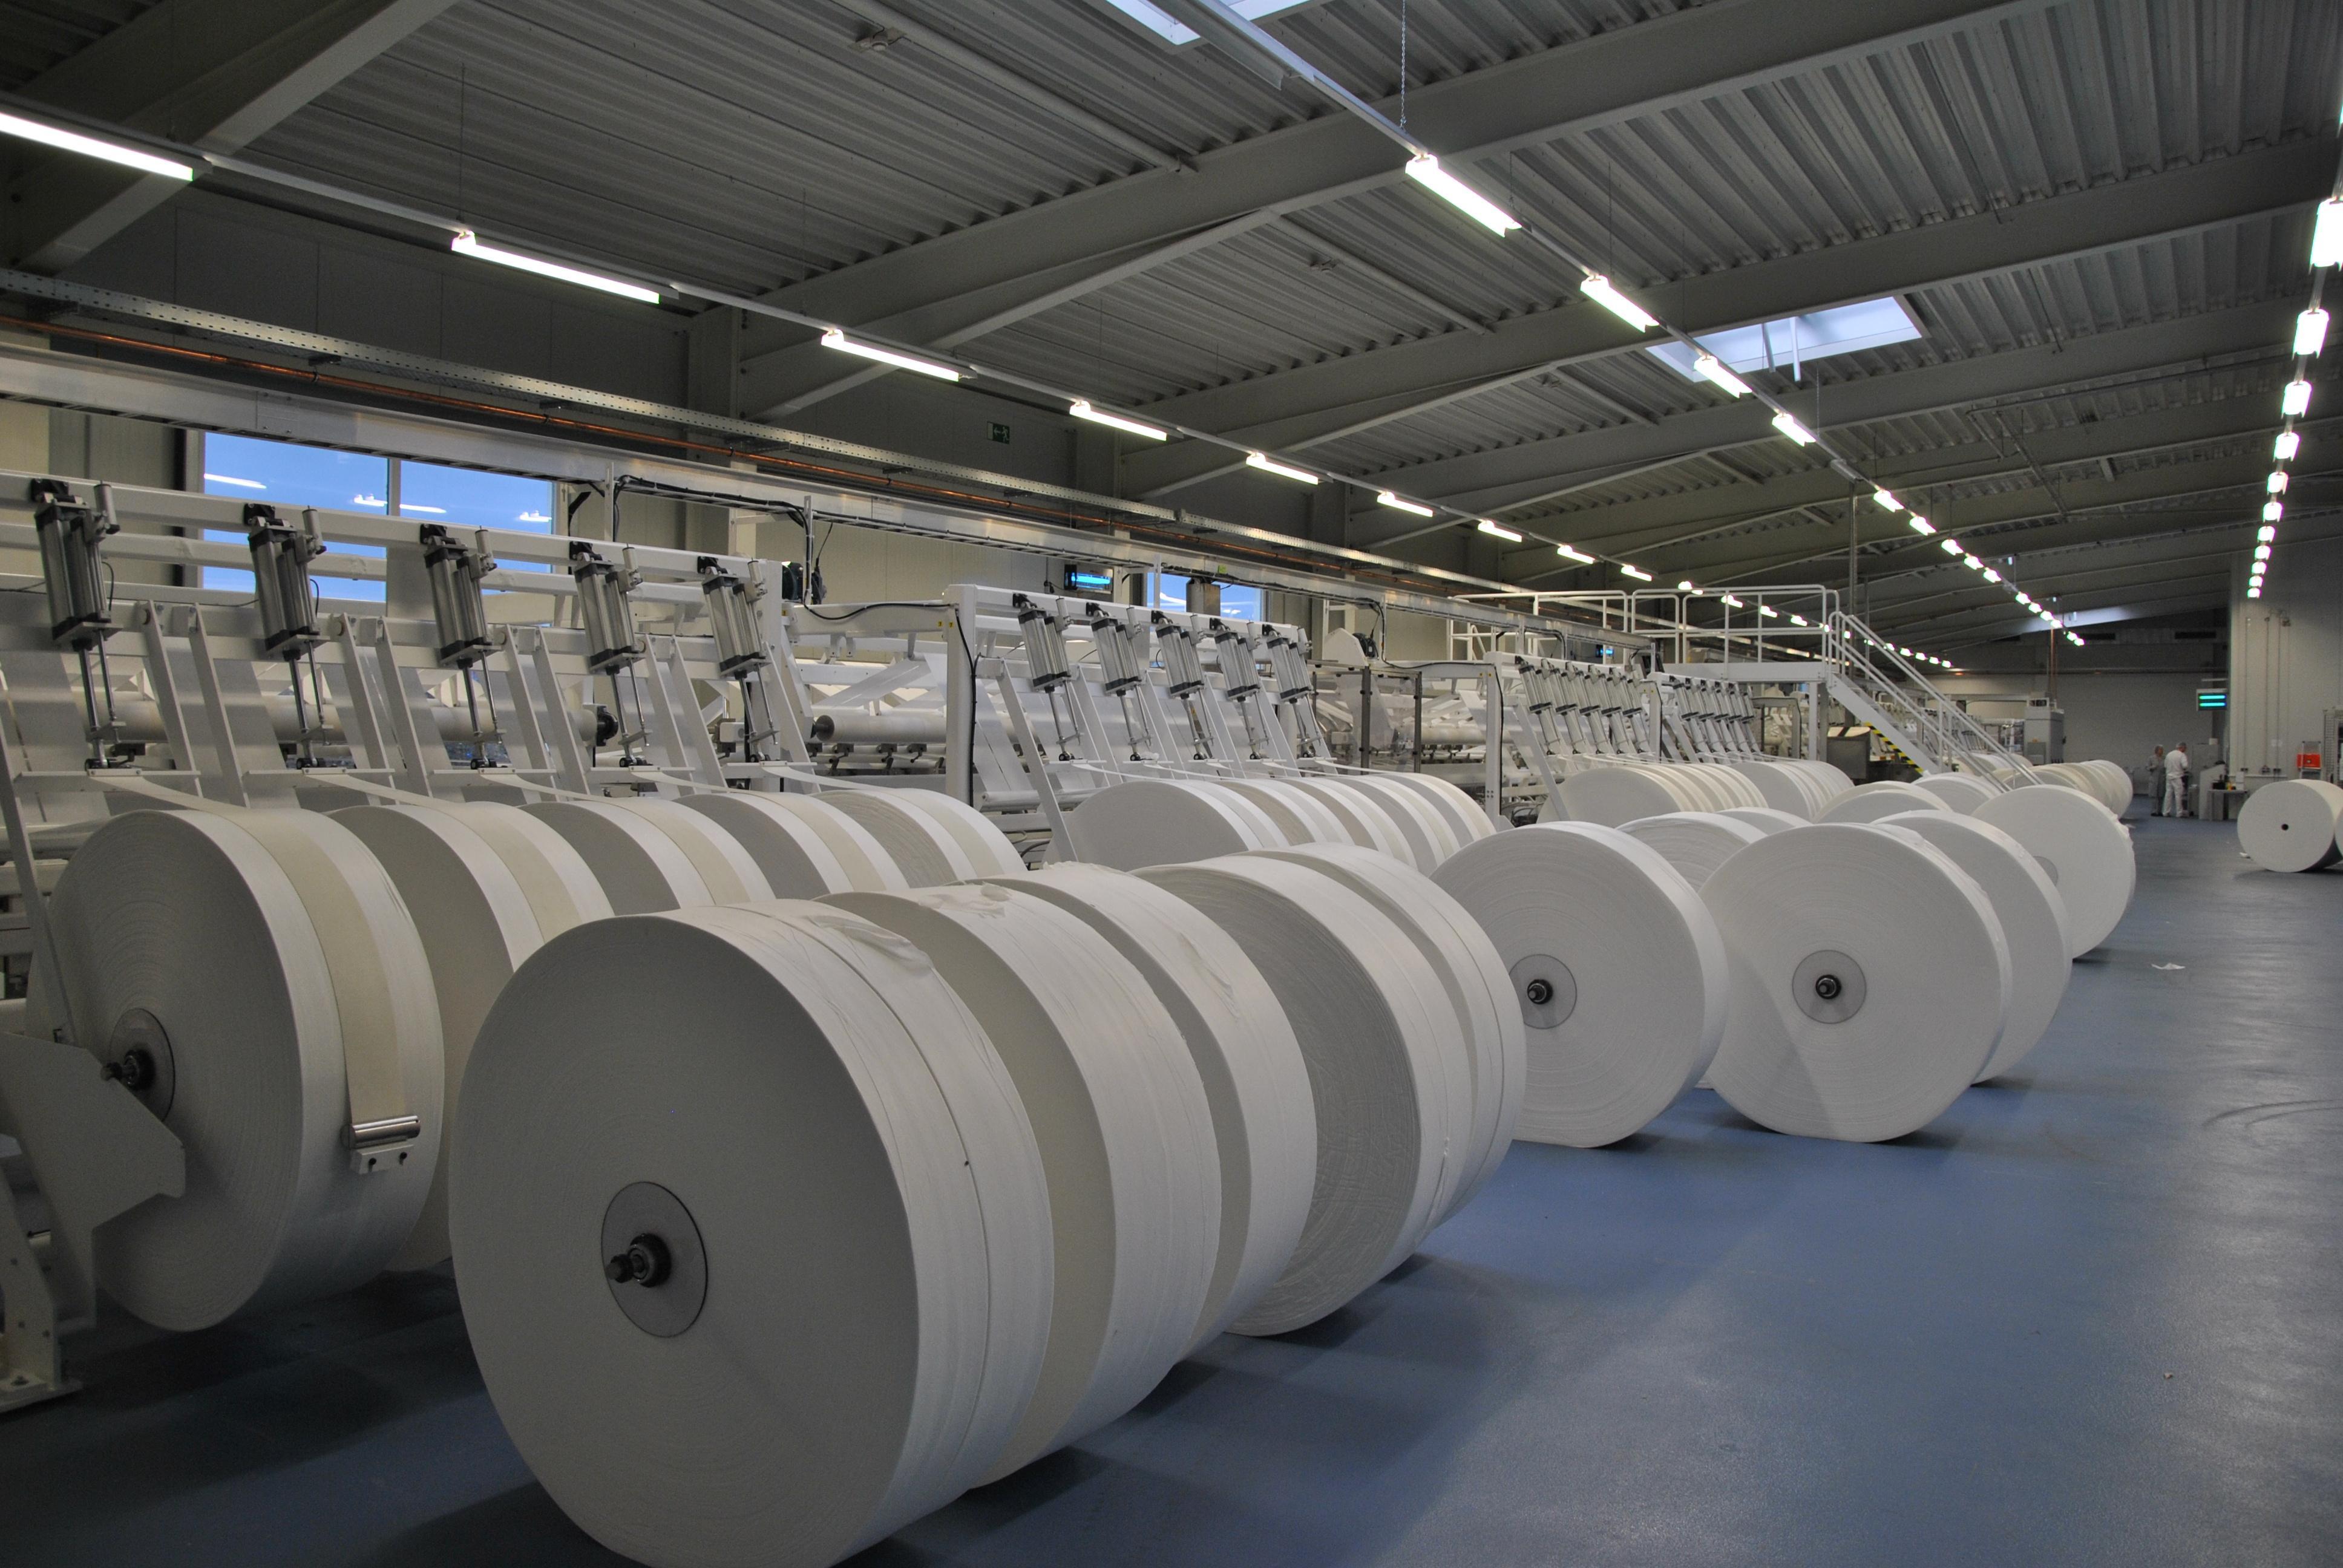 Global-manufacturing-wet-wipes-Albaad - Albaad